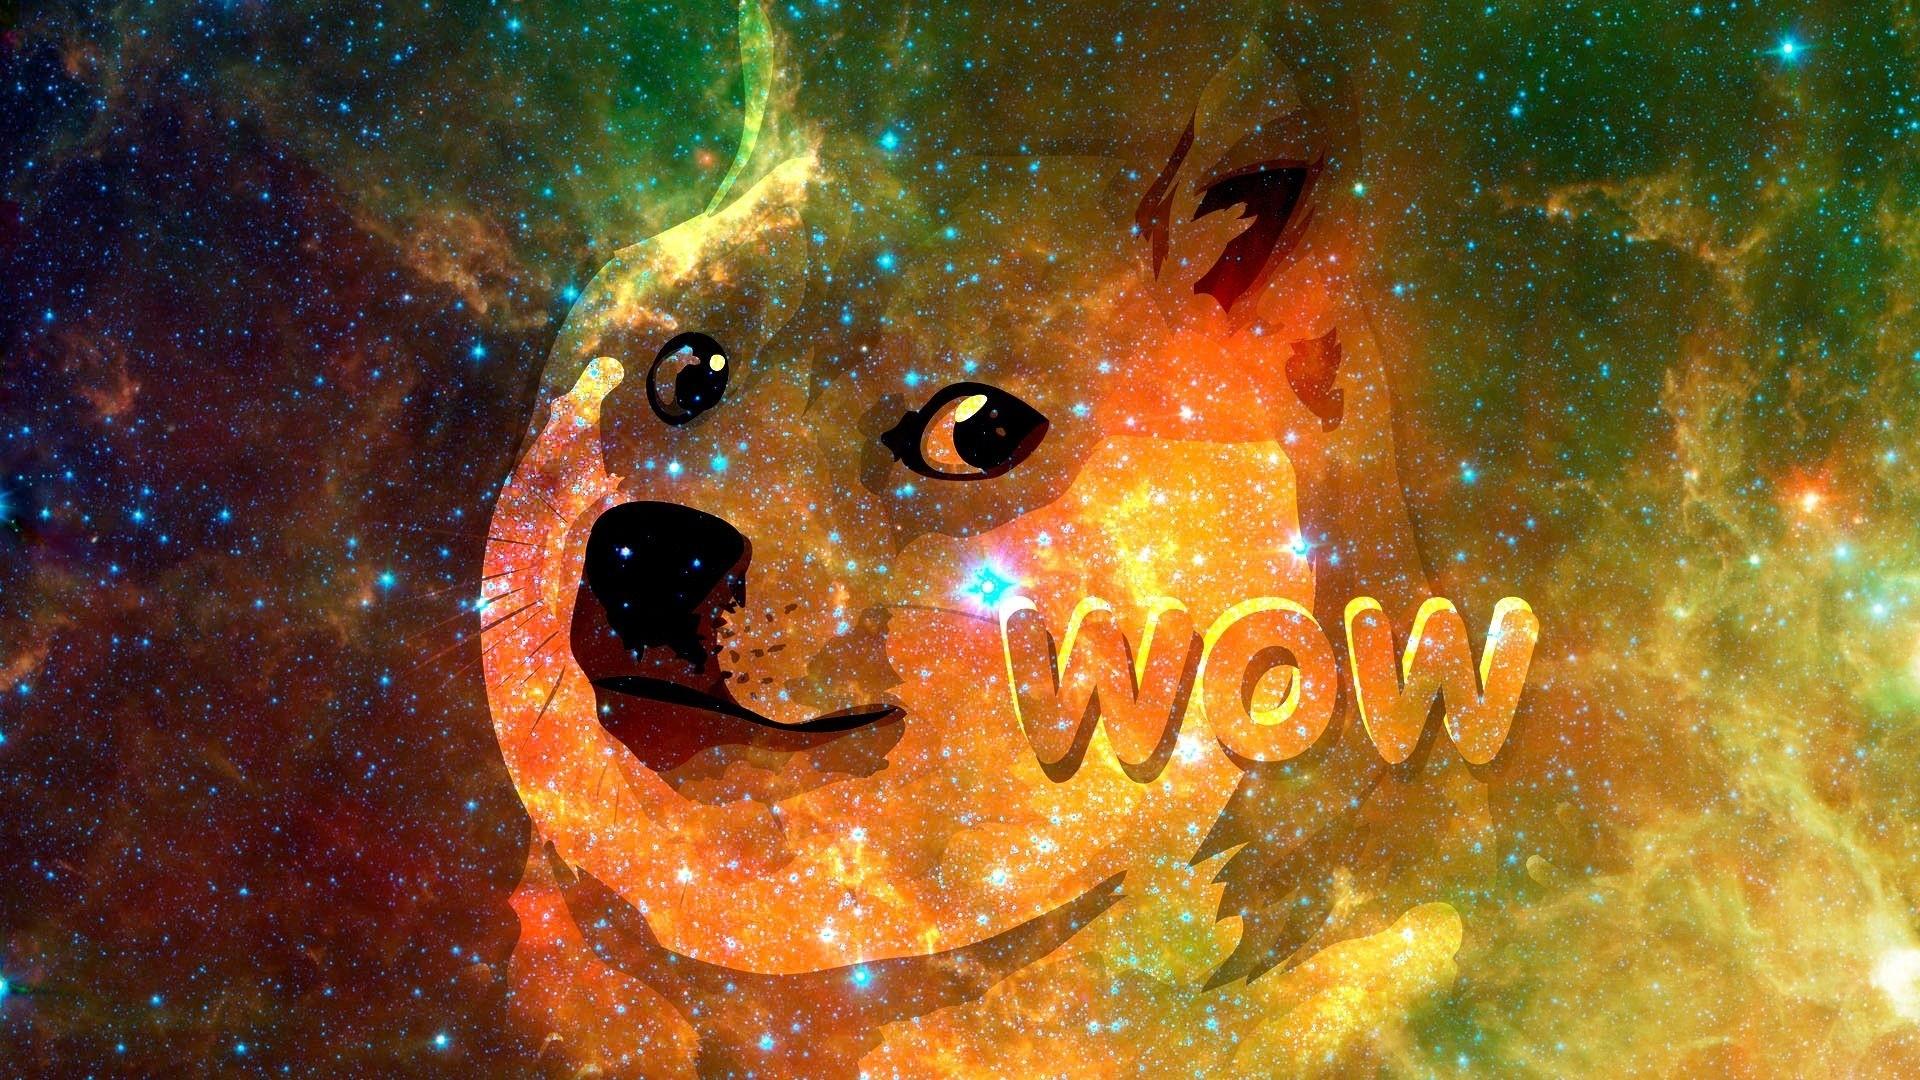 doge-wallpaper-16.jpeg579 KB